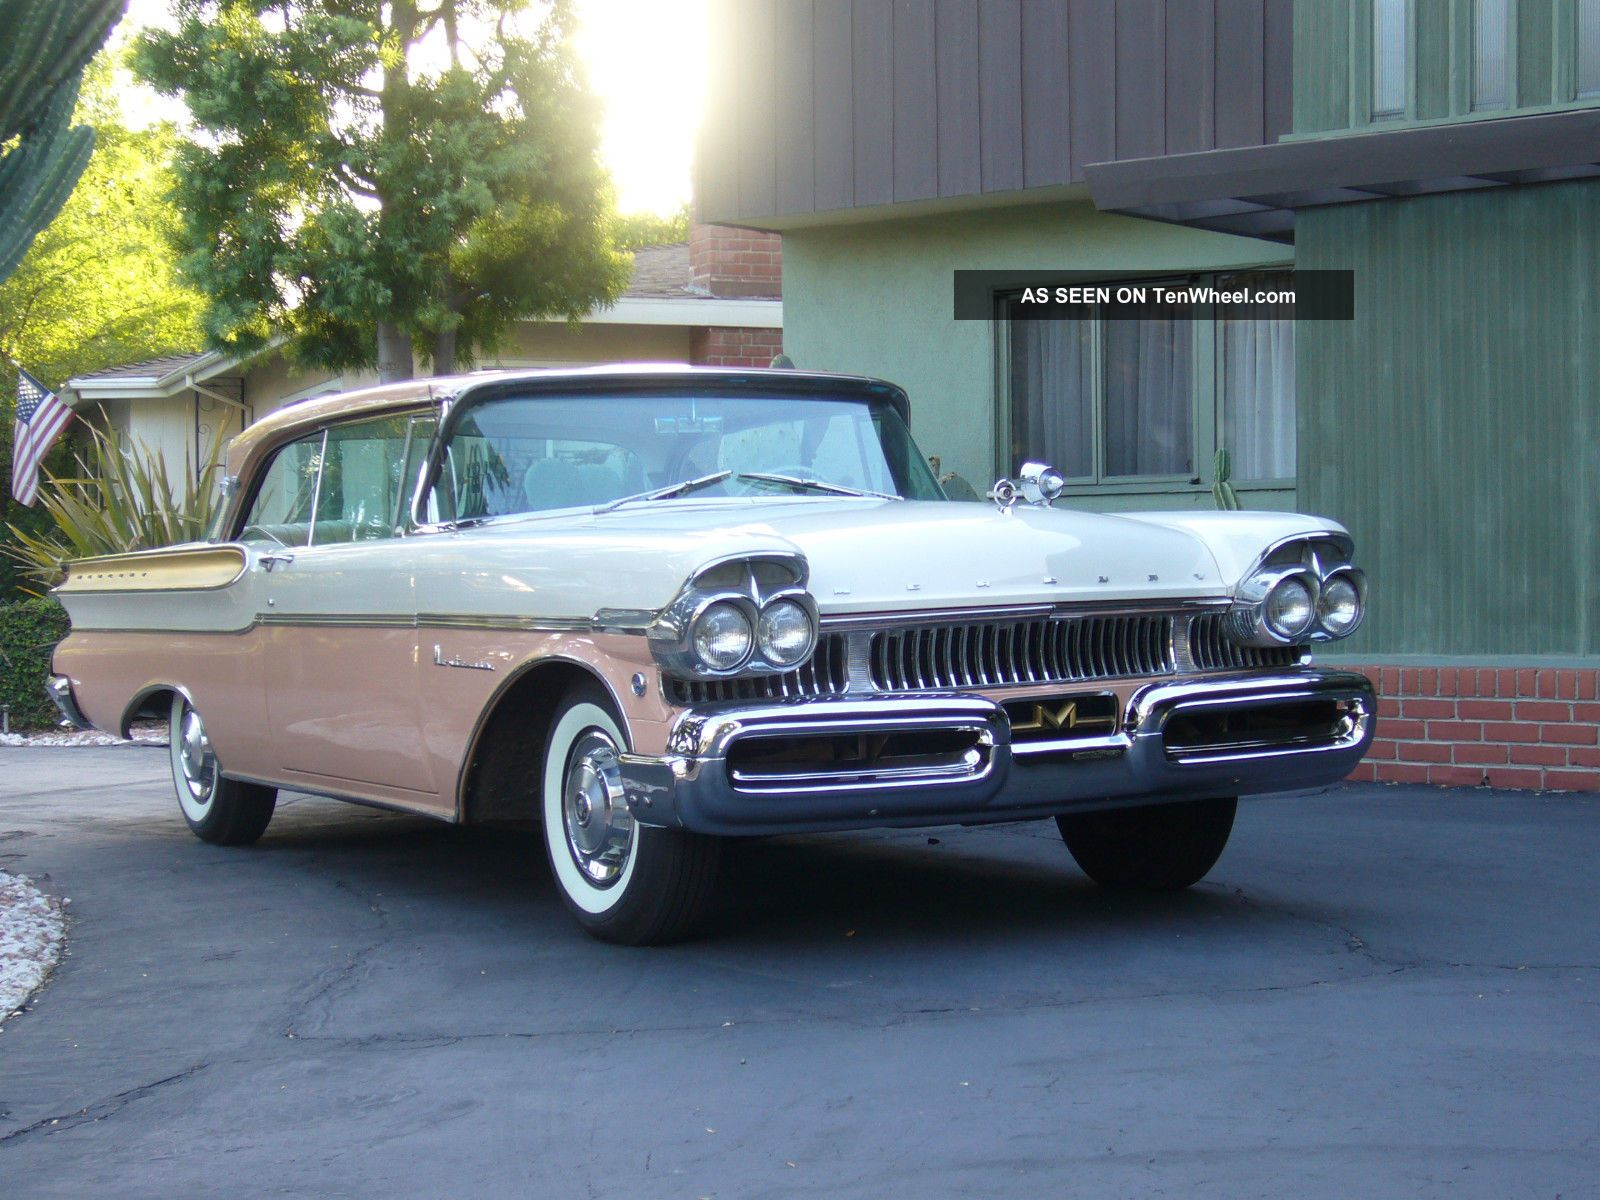 1957 Mercury Montclair 2 Door Hard Top 8 Cyl Good Condition Other photo